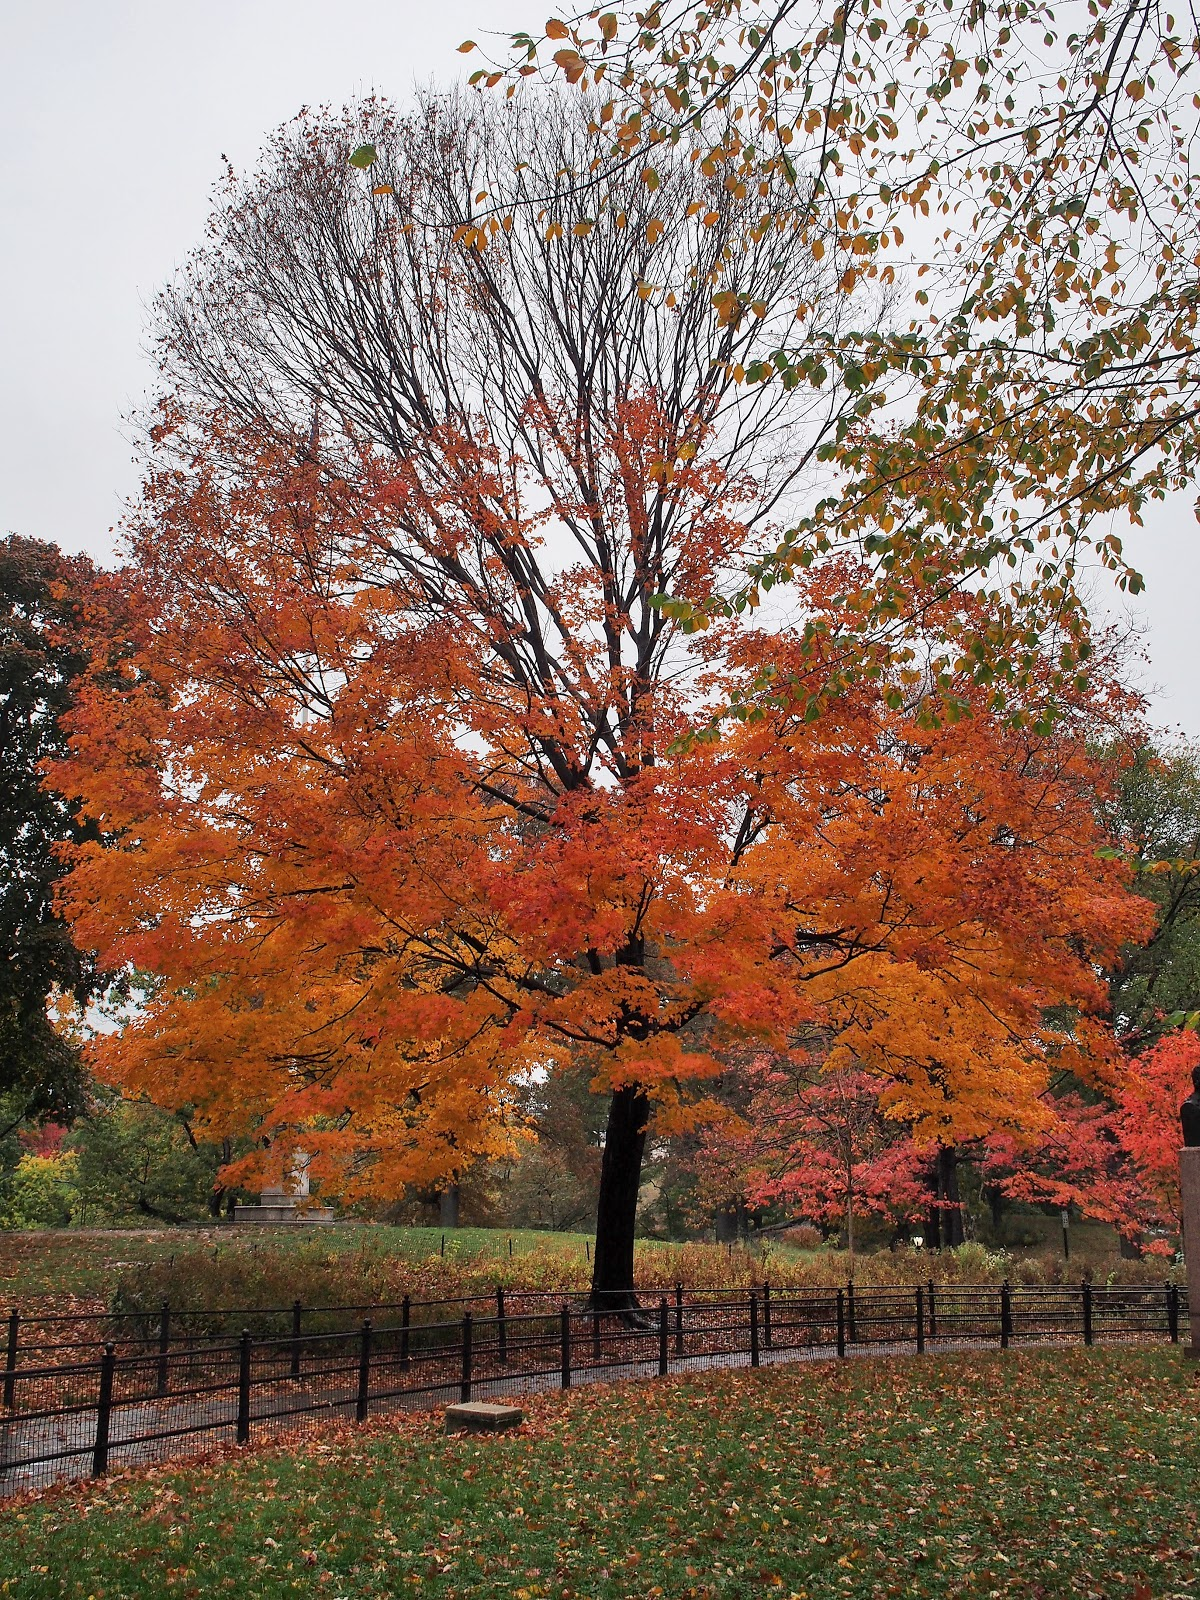 Orange, #orange #centralpark #NYC #fallincentralpark #fallinNYC 2014